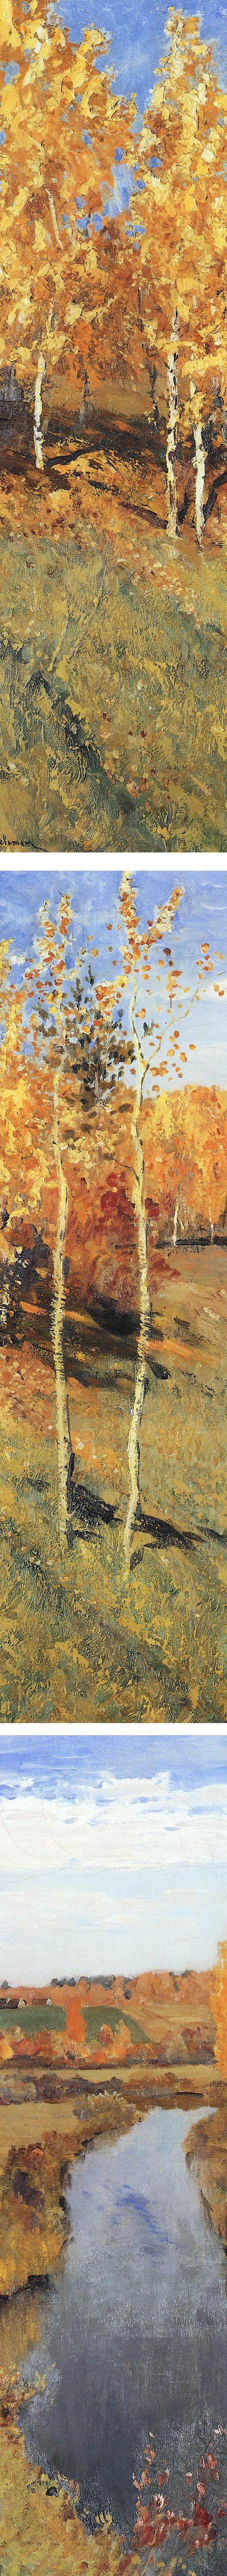 Golden Autumn (Zolotaya Osen), Isaac Levitan (details)